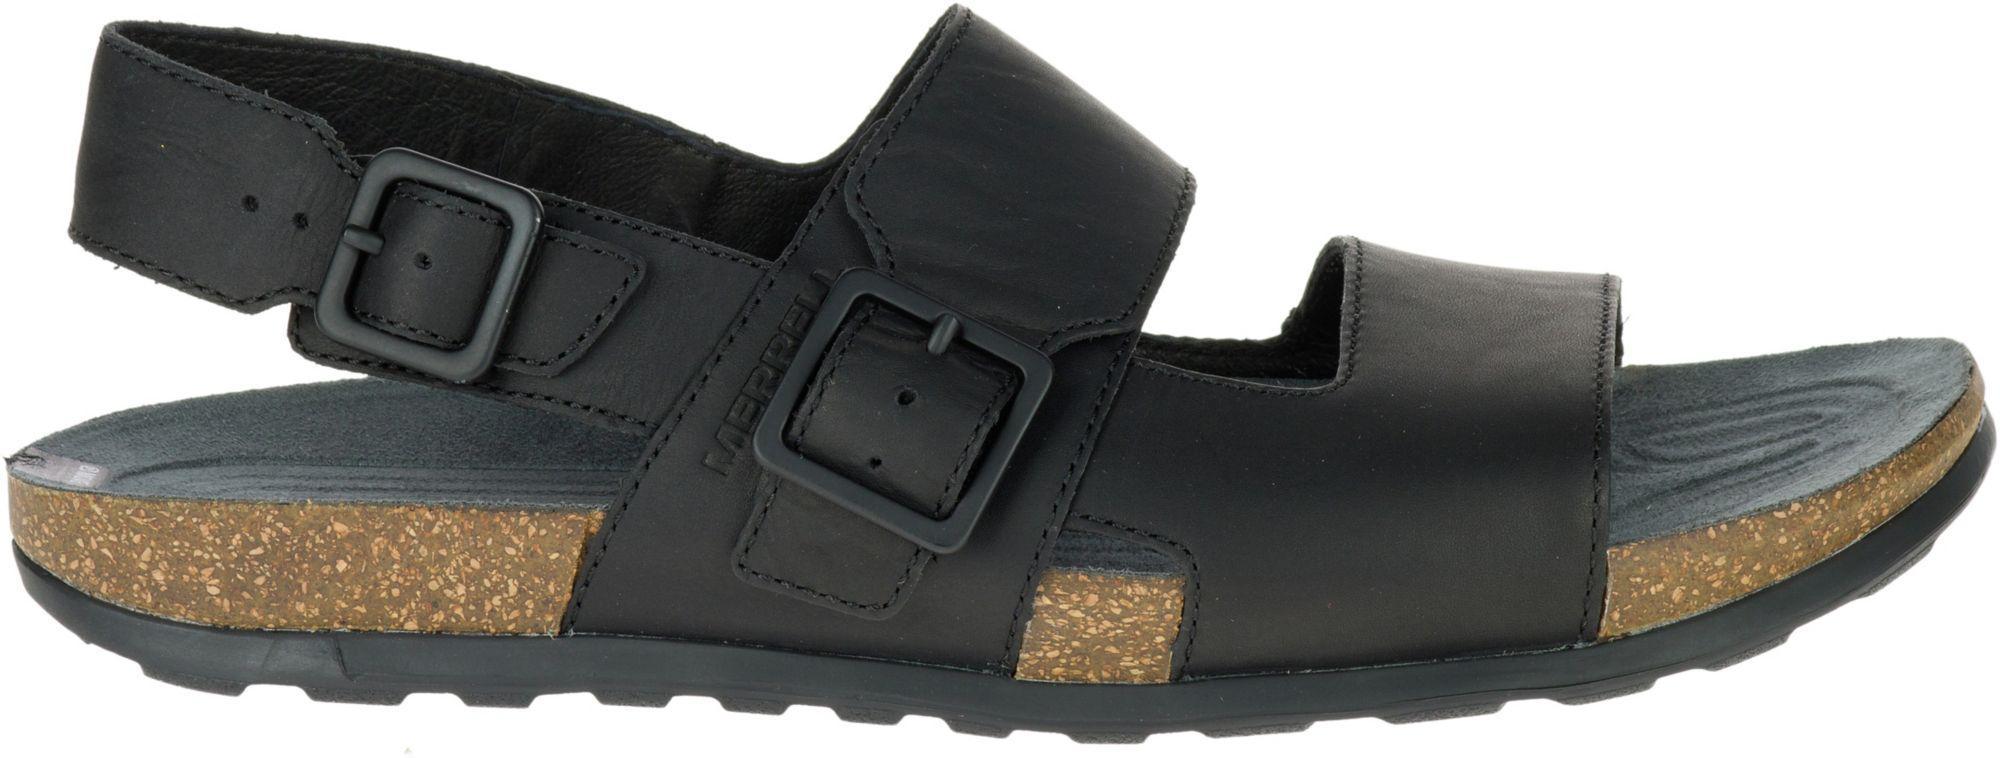 c7f884ea56 Lyst - Merrell Downtown Backstrap Buckle Sandals in Black for Men